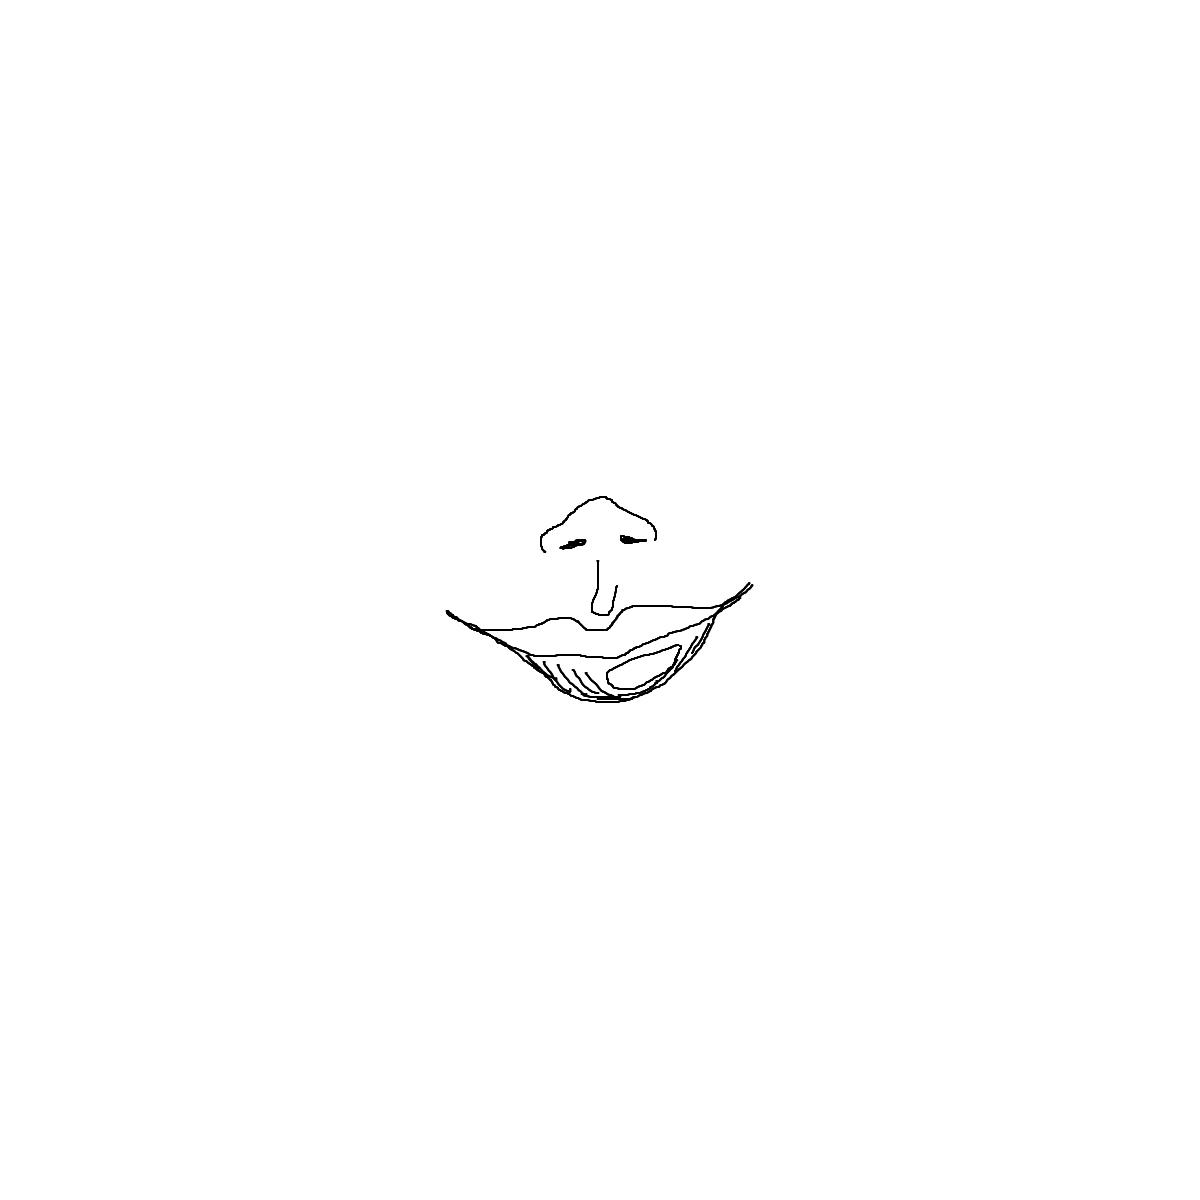 BAAAM drawing#5566 lat:45.4415893554687500lng: -75.6911239624023400